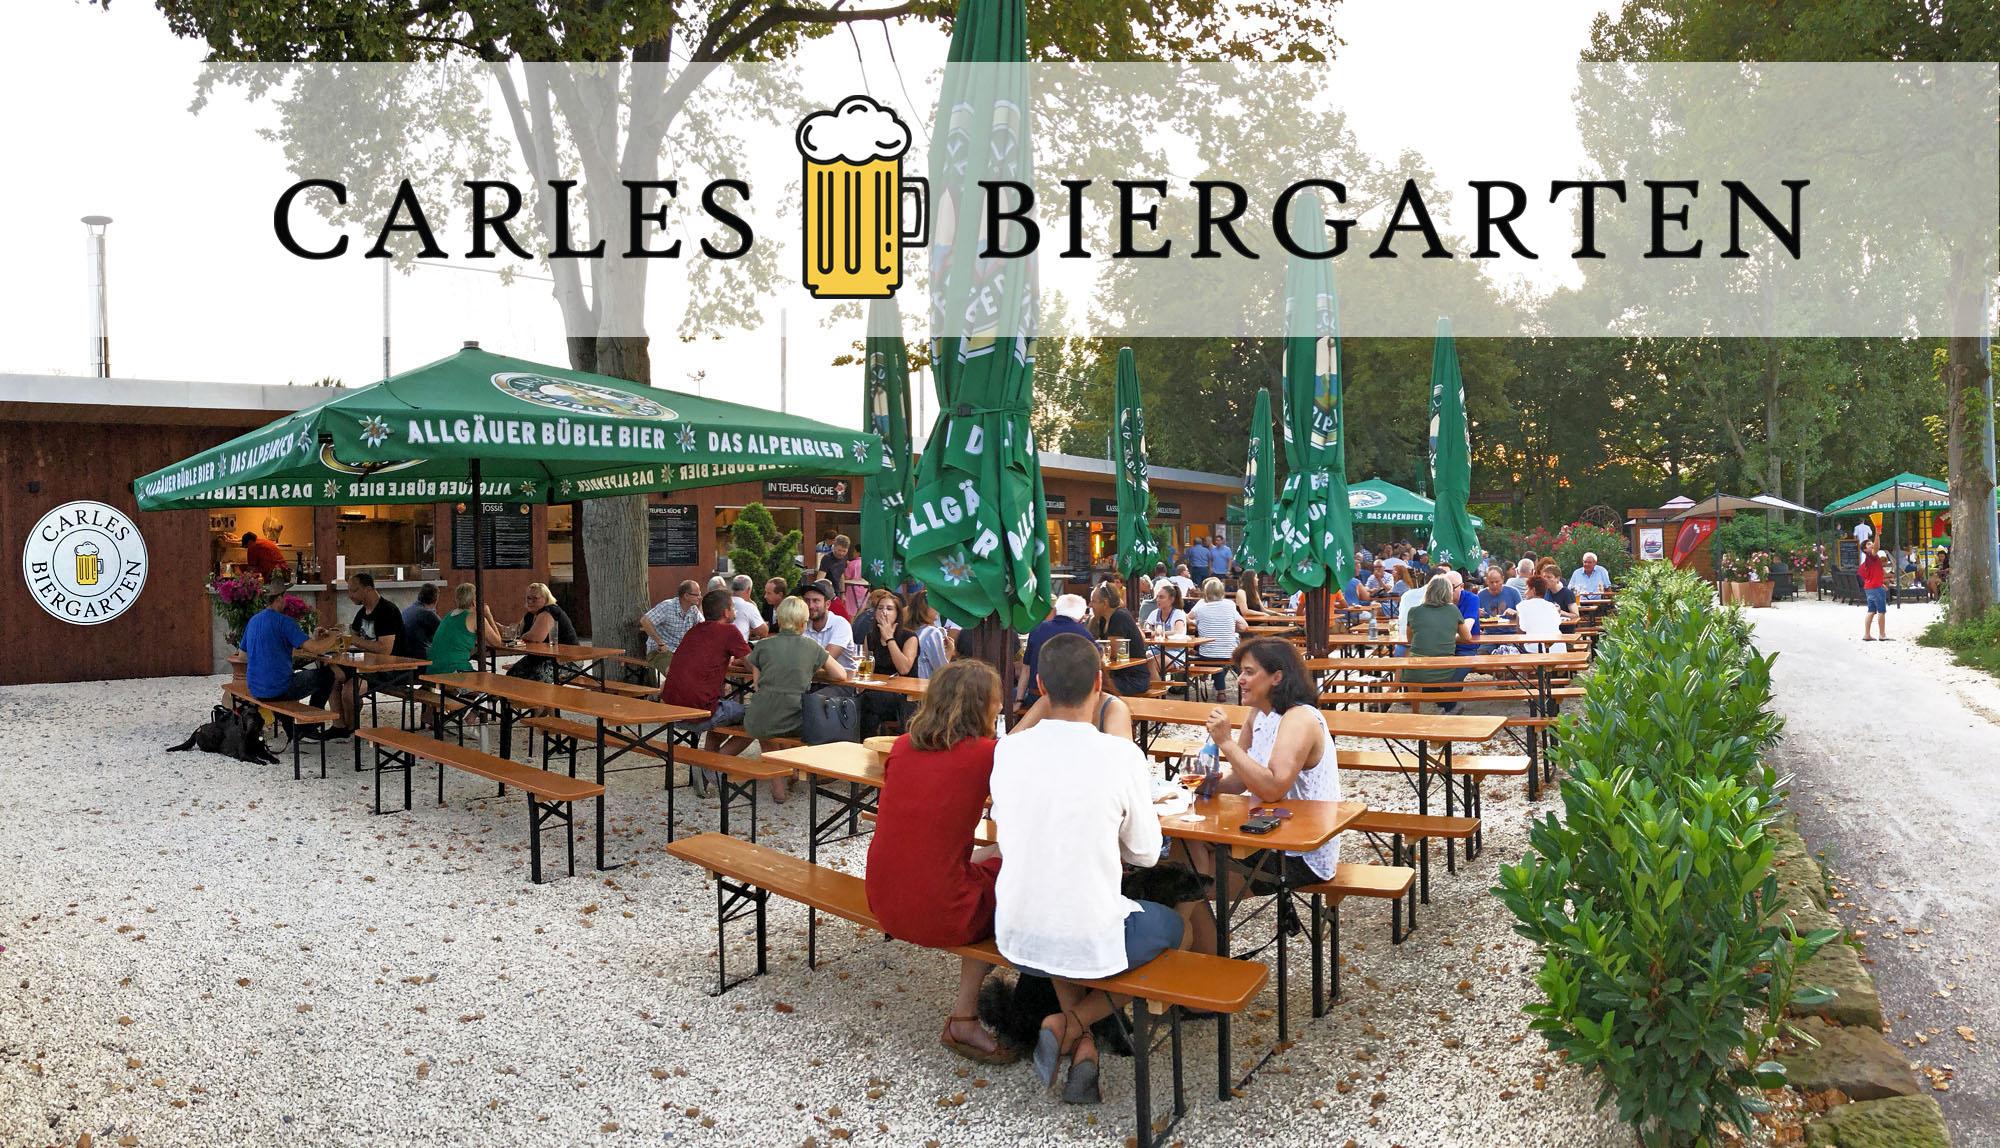 Carles Biergarten